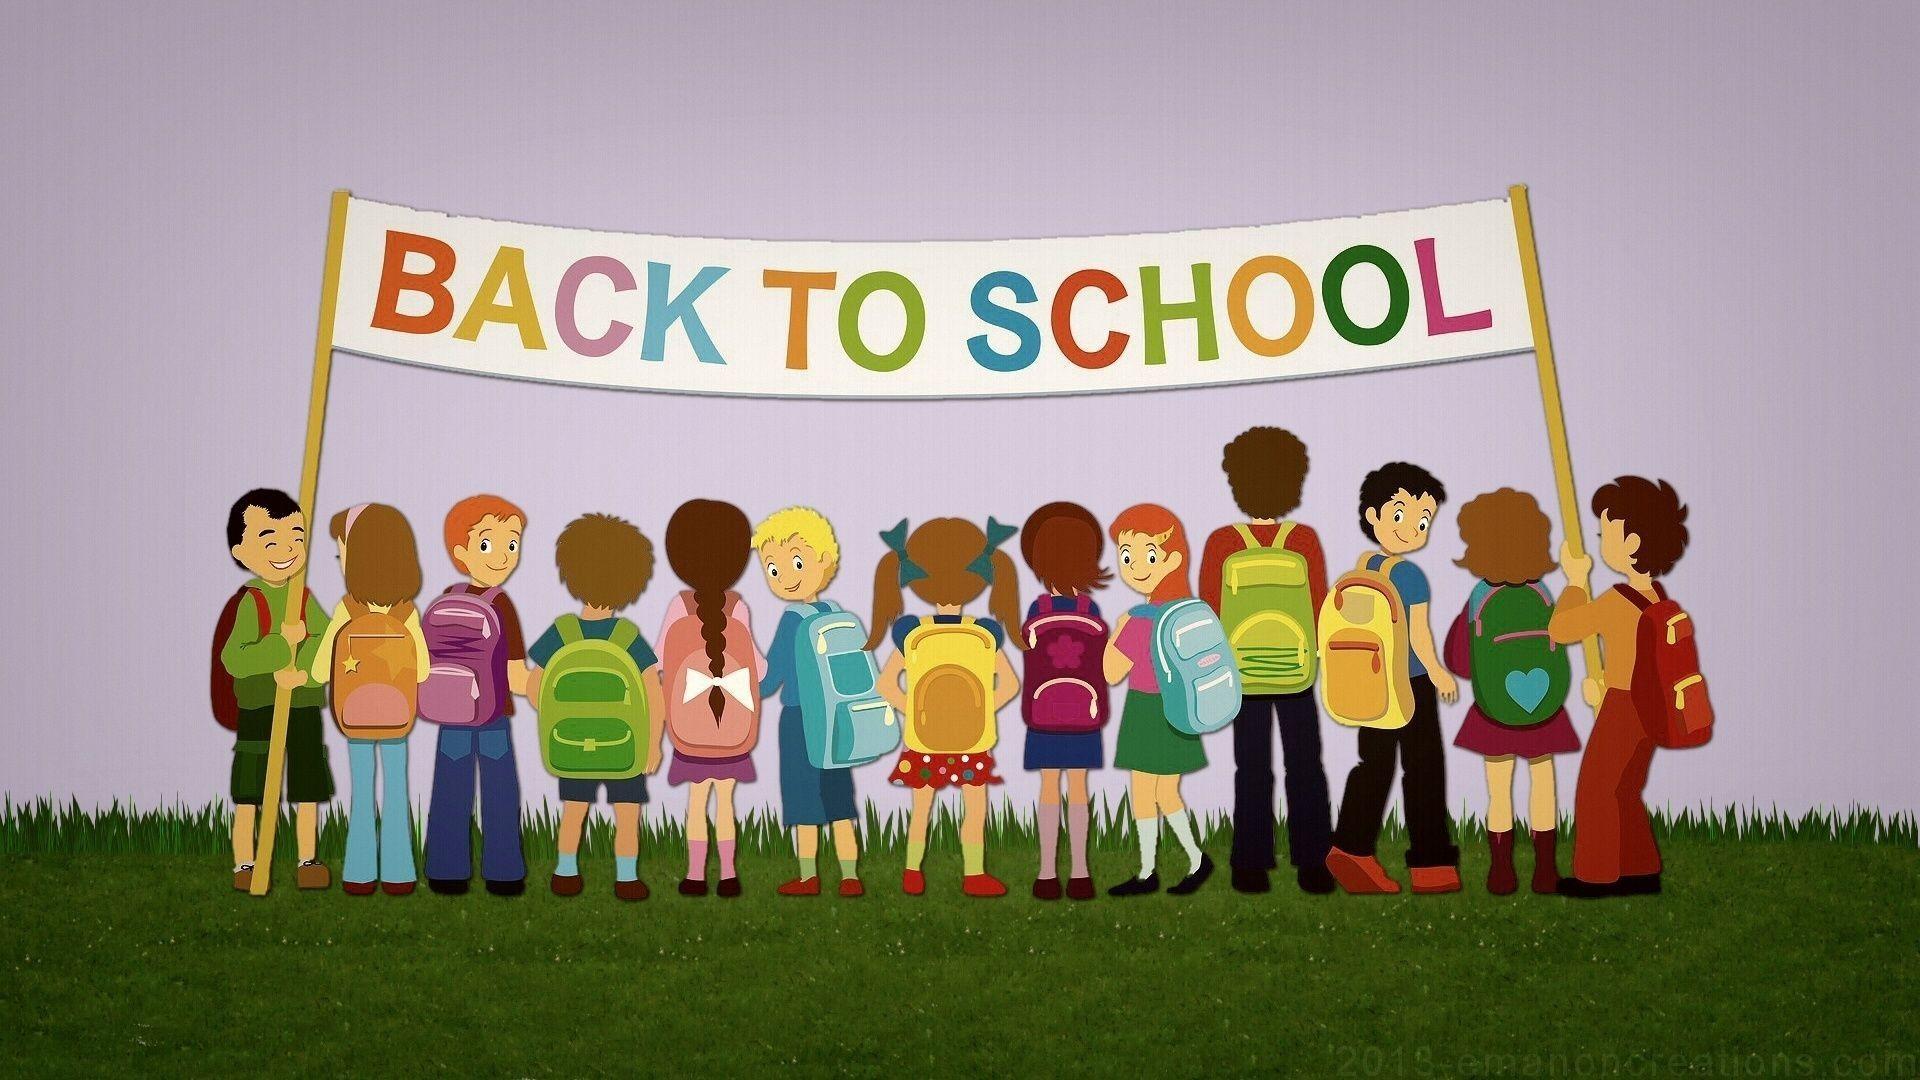 Educational, School, Back To School Wallpapers And - Background Wallpaper Back To School - HD Wallpaper